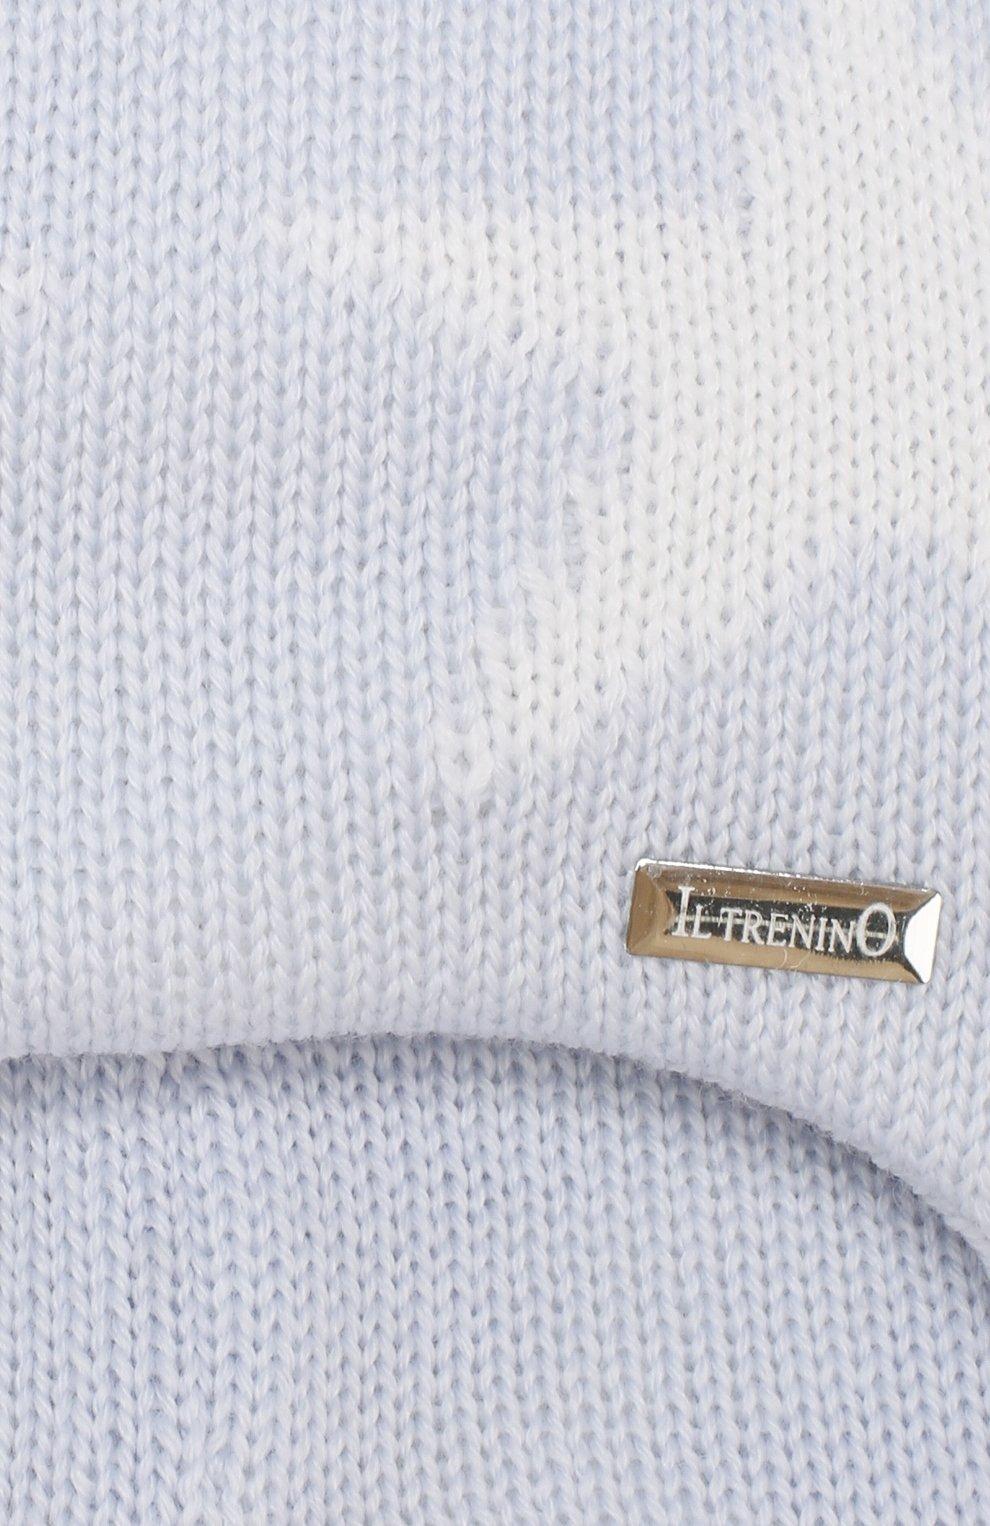 Детского шерстяная шапка IL TRENINO голубого цвета, арт. 19 5804/E0 | Фото 3